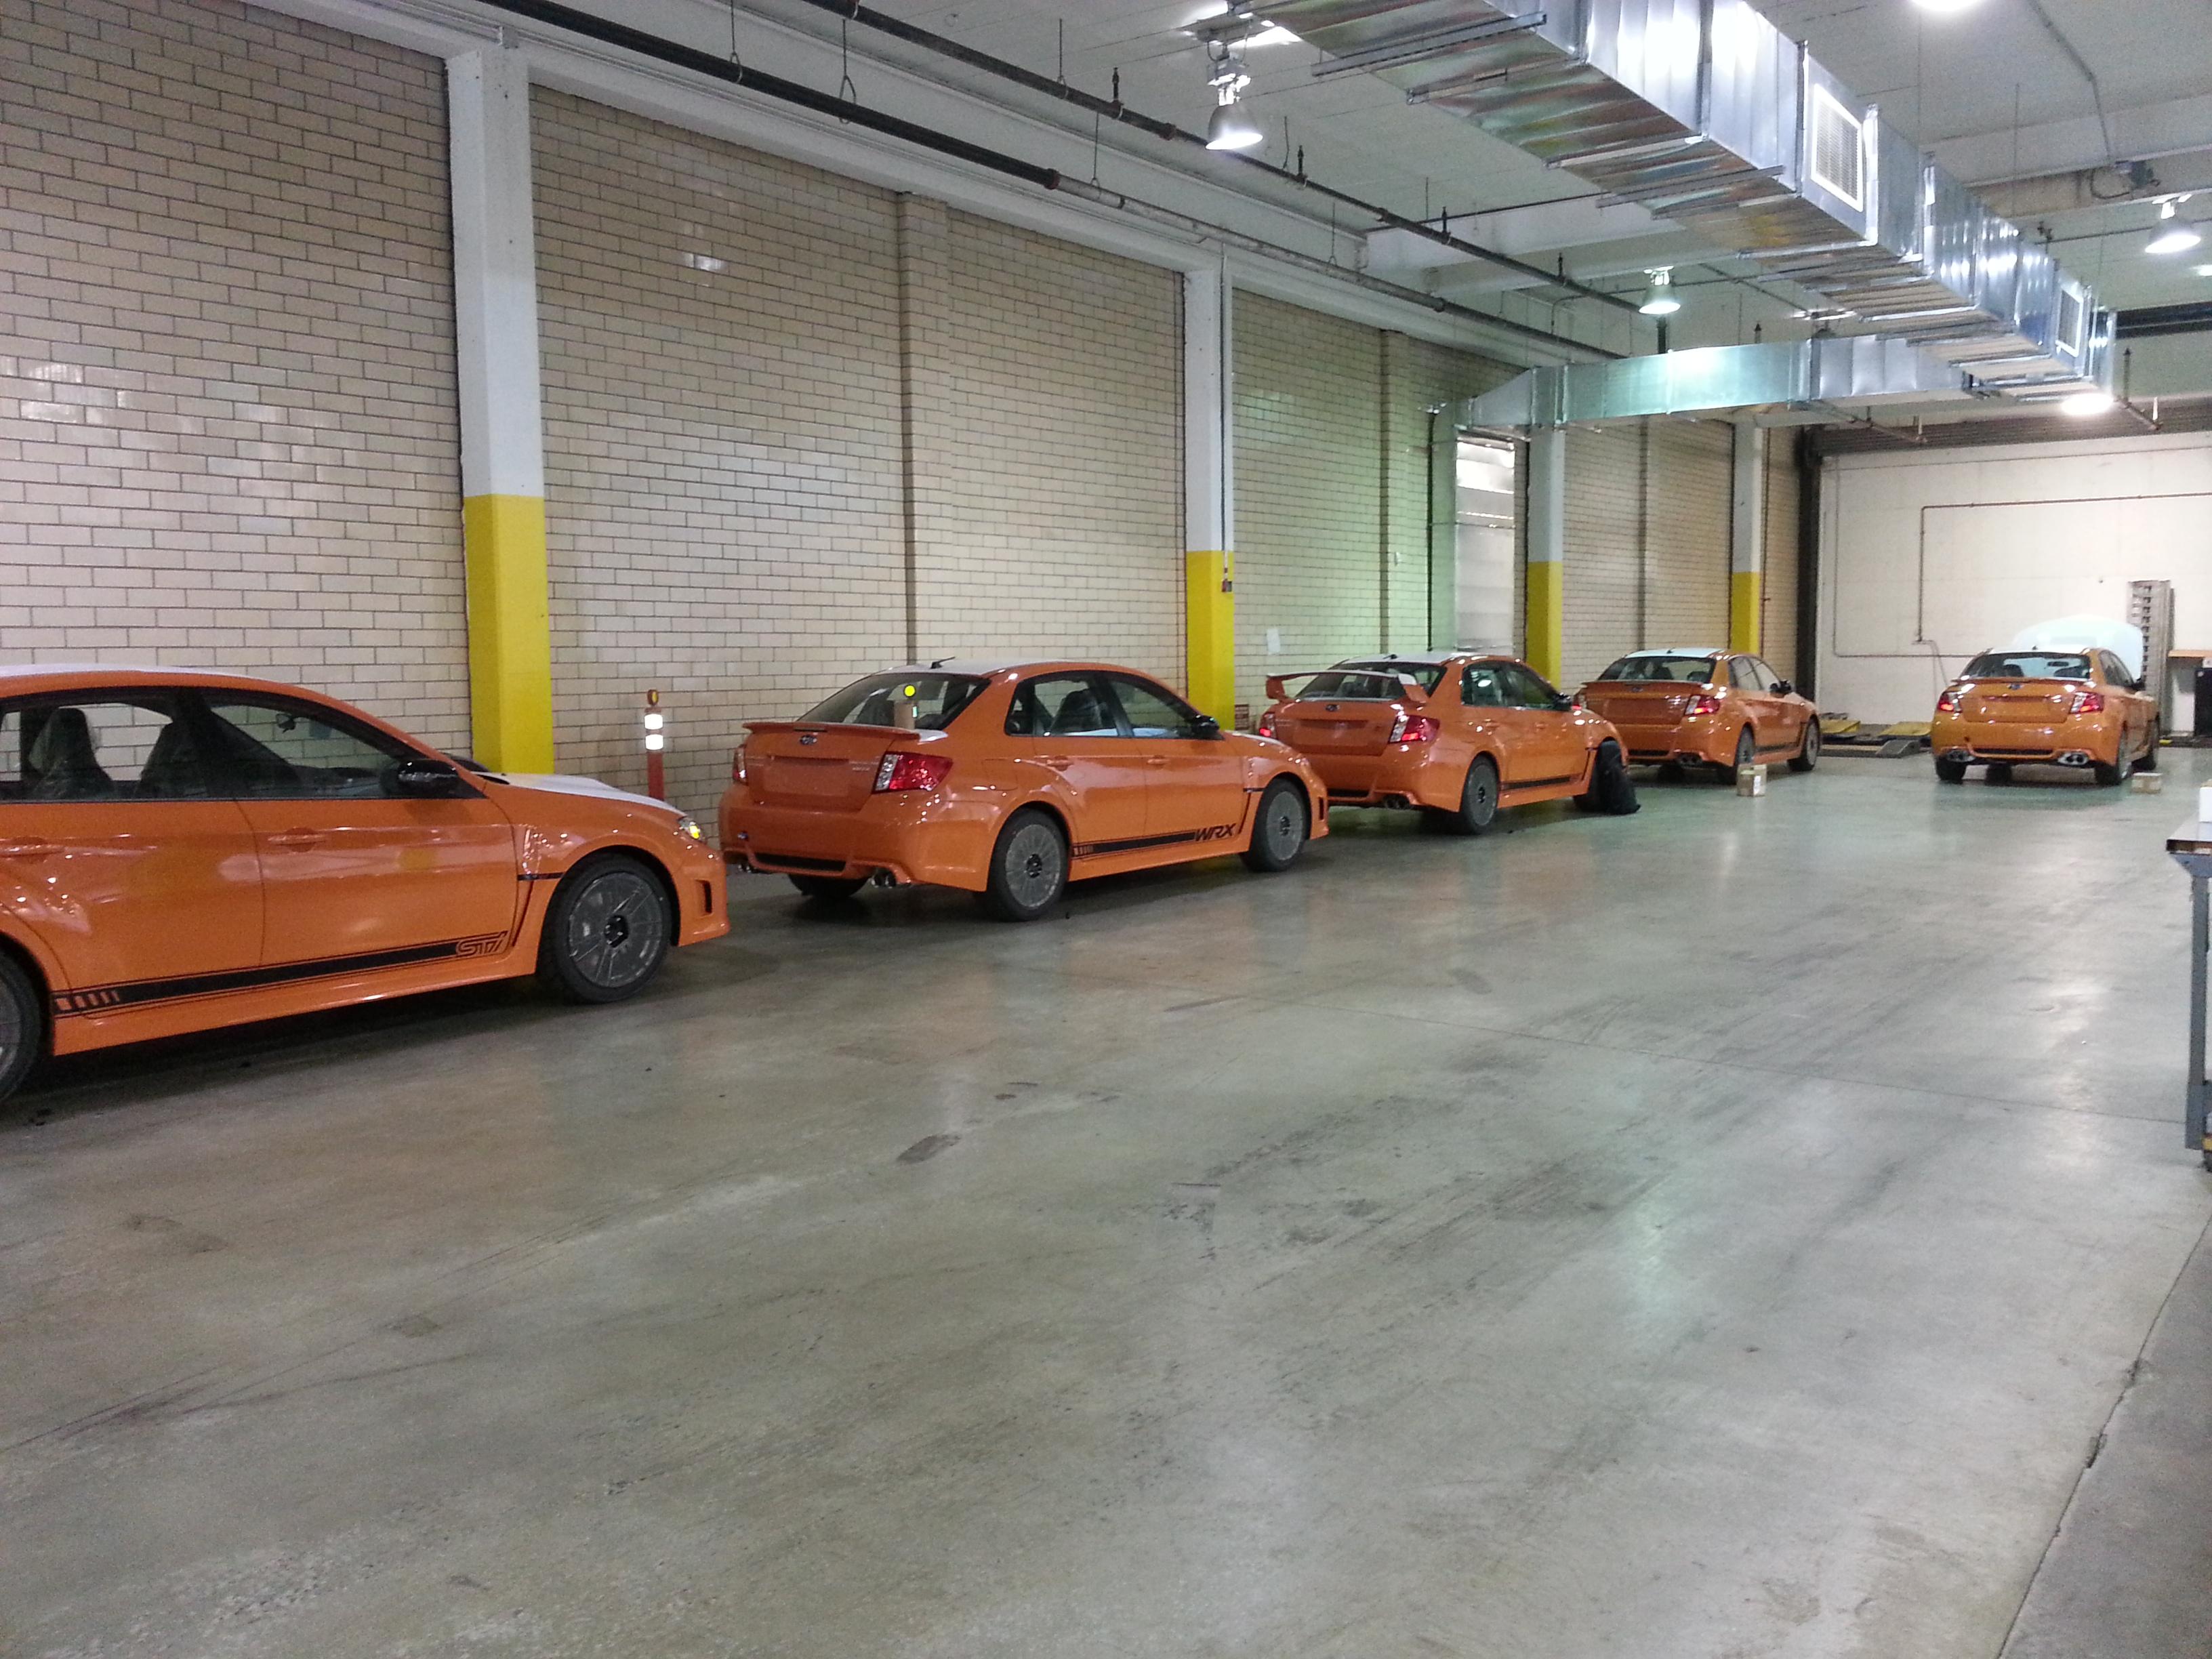 Subaru Fleet Installation 3M 1080